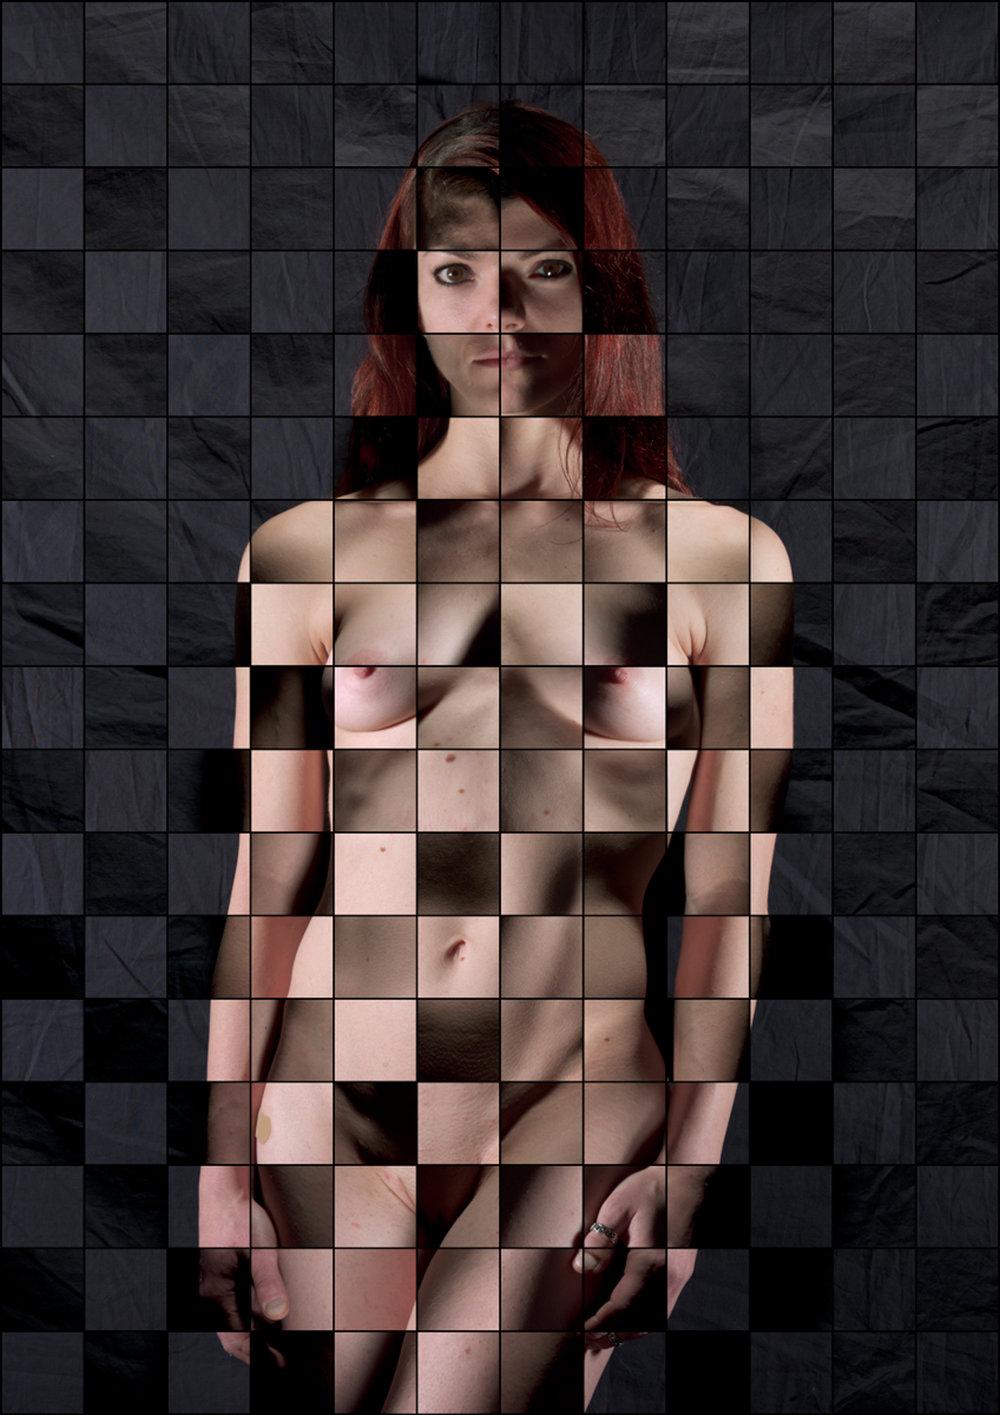 cube11.jpg